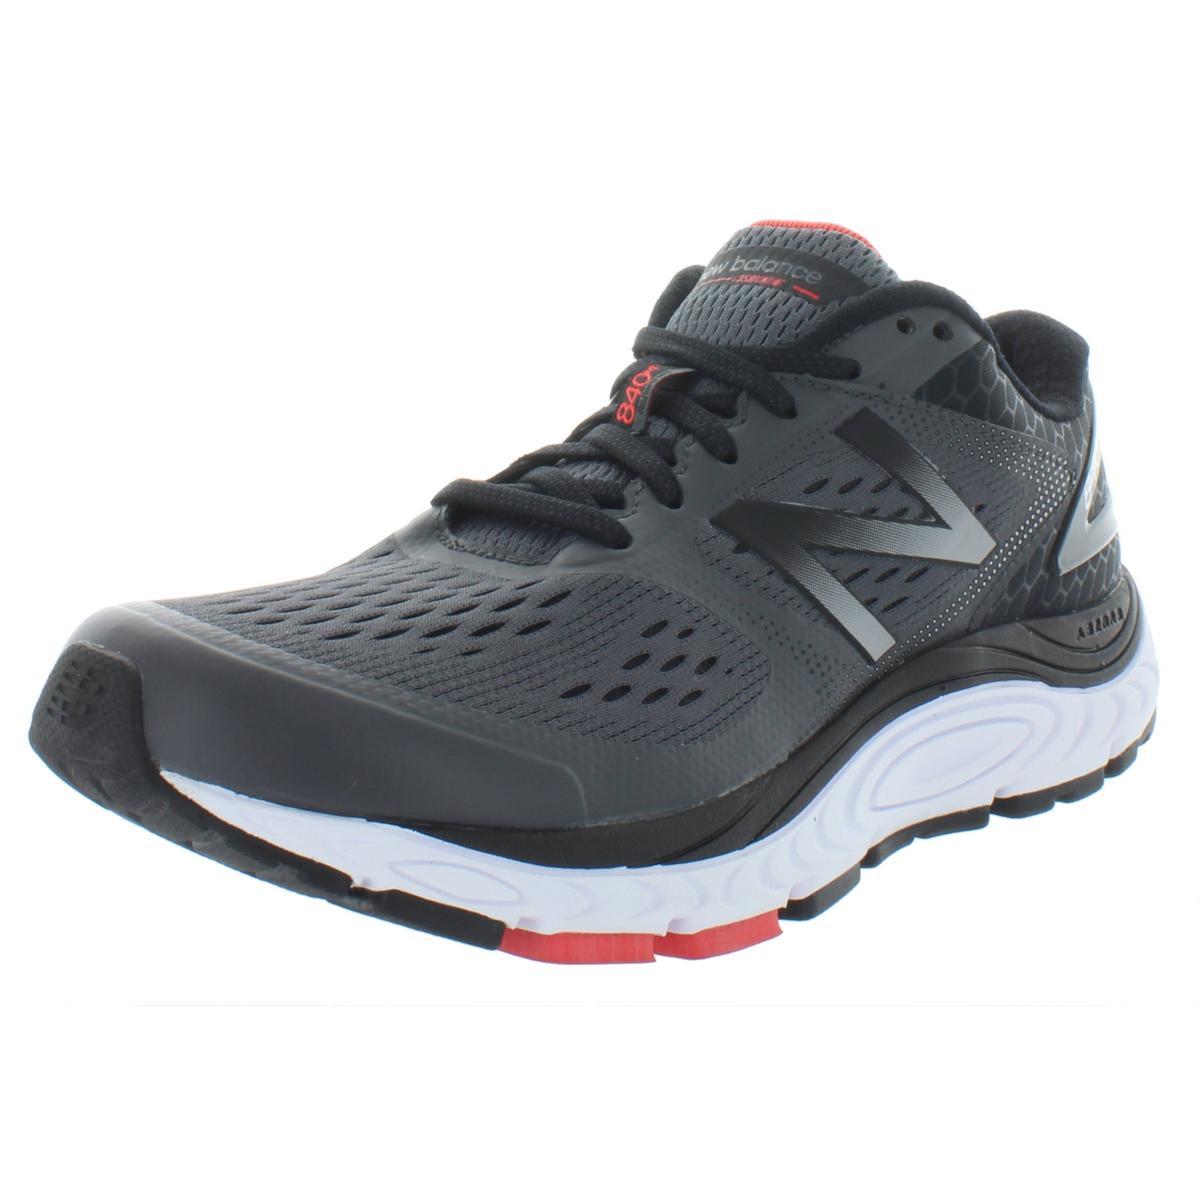 New Balance Mens 840V4 Gray Running Shoes Sneakers 8 Medium